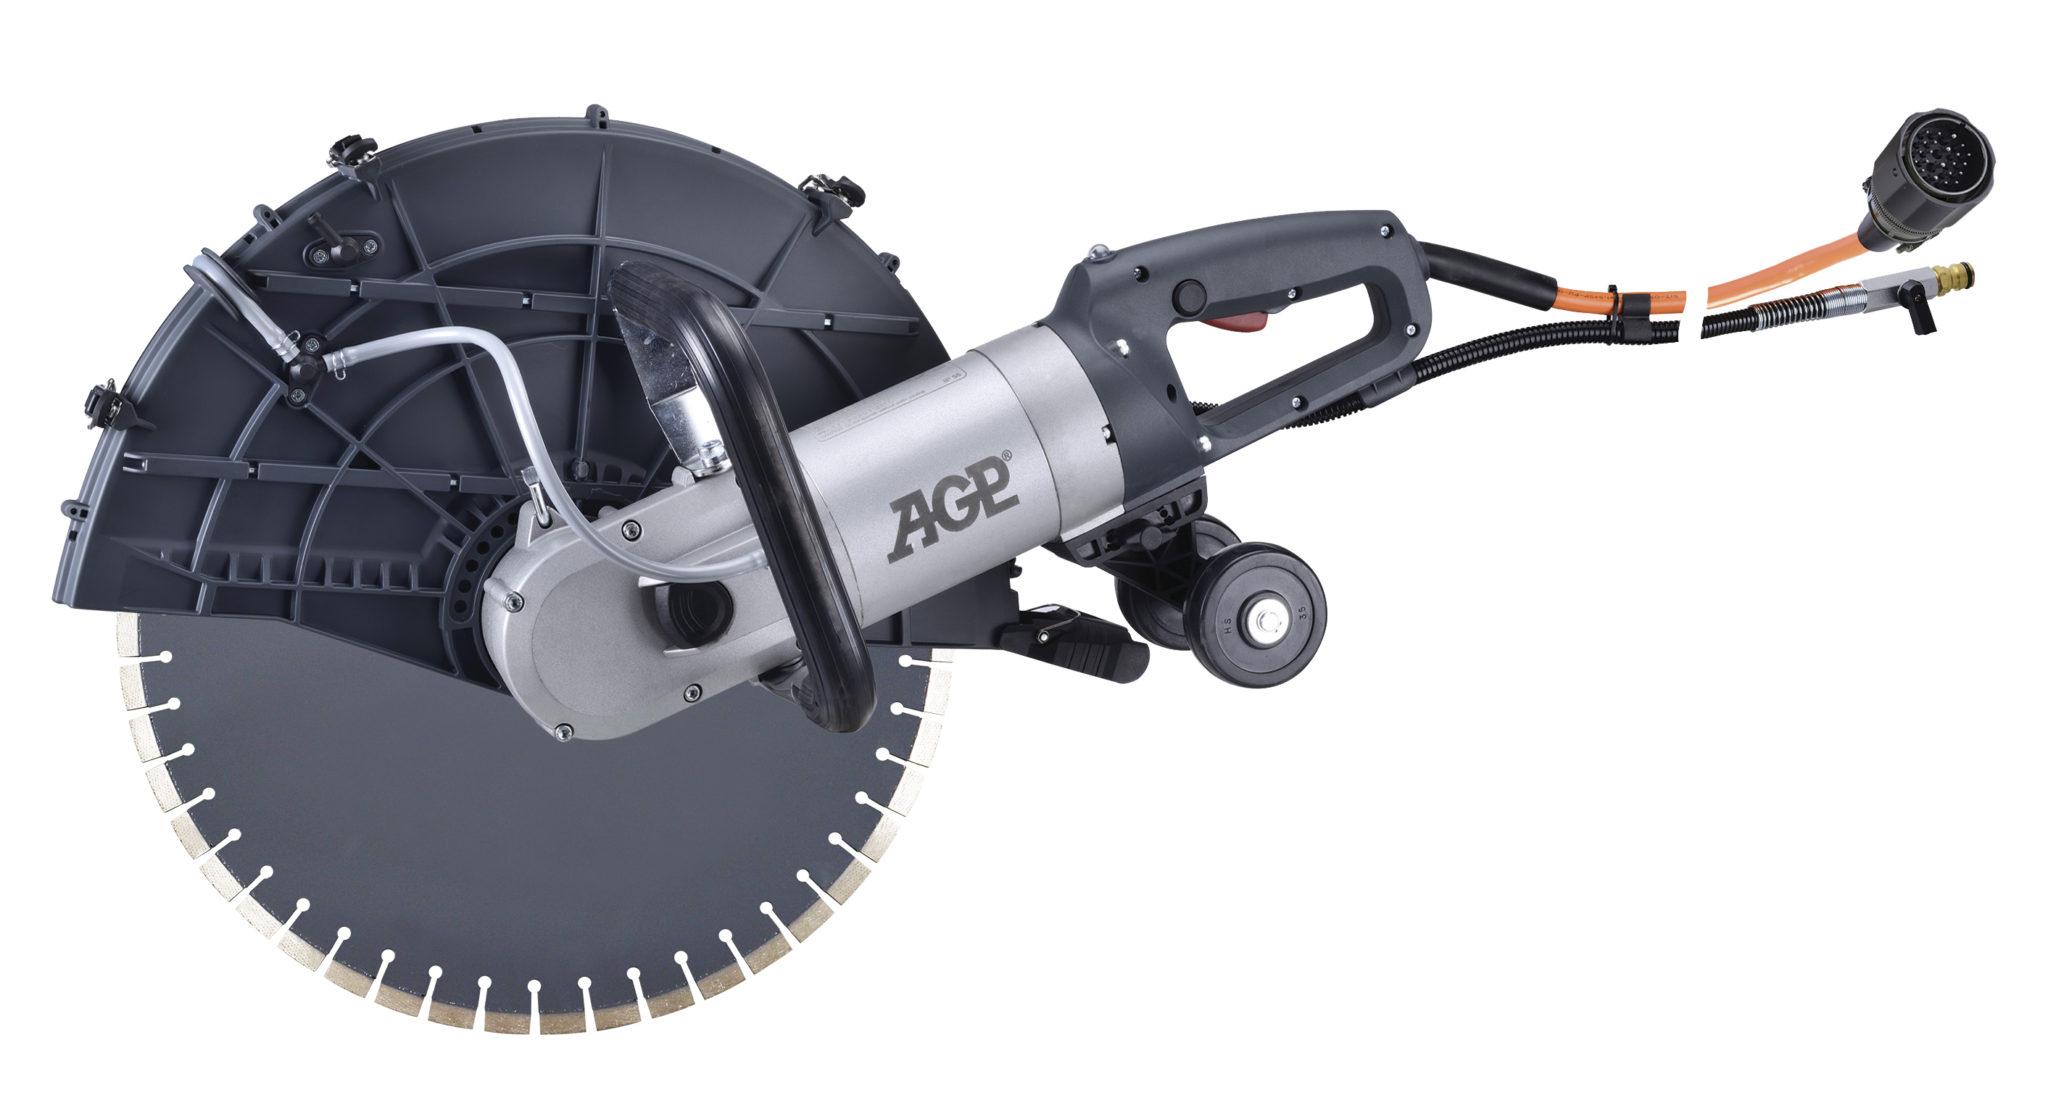 Hochfrequenz - Dia - Handsäge AGP C18/400V/6500W / 230V/5500W/S-Tiefe 175mm/11.6kg/Motor Wasserg.&Bürstenlos/Bündigschnitte